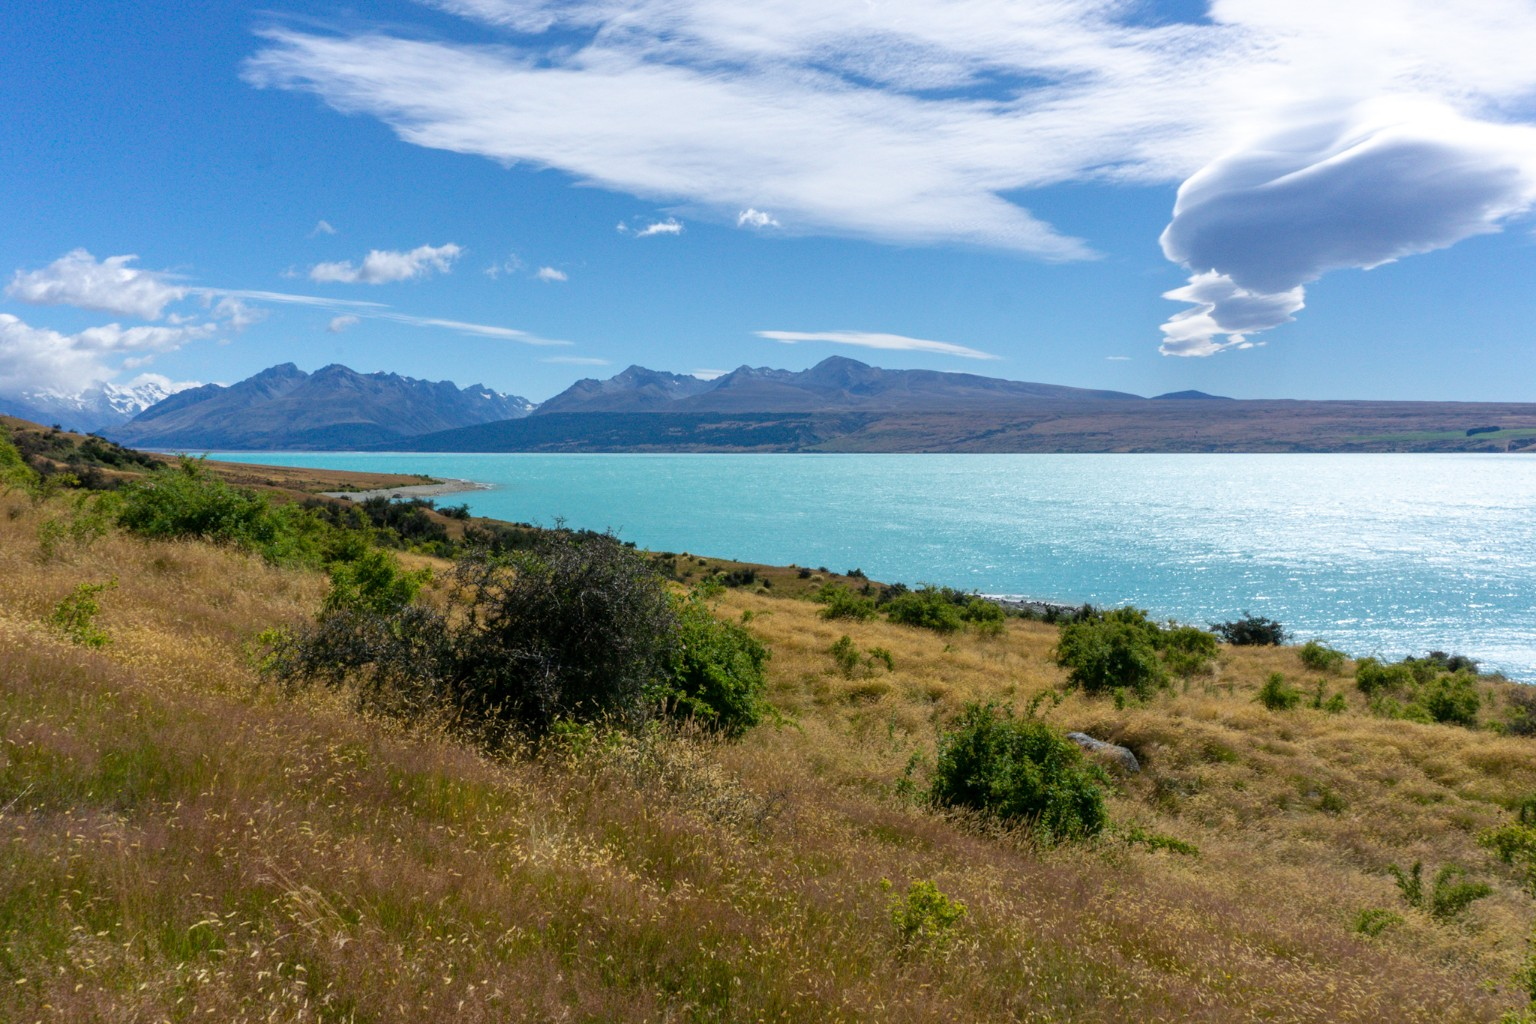 Lake Pukaki nähe des Mount Cook Nationalparks